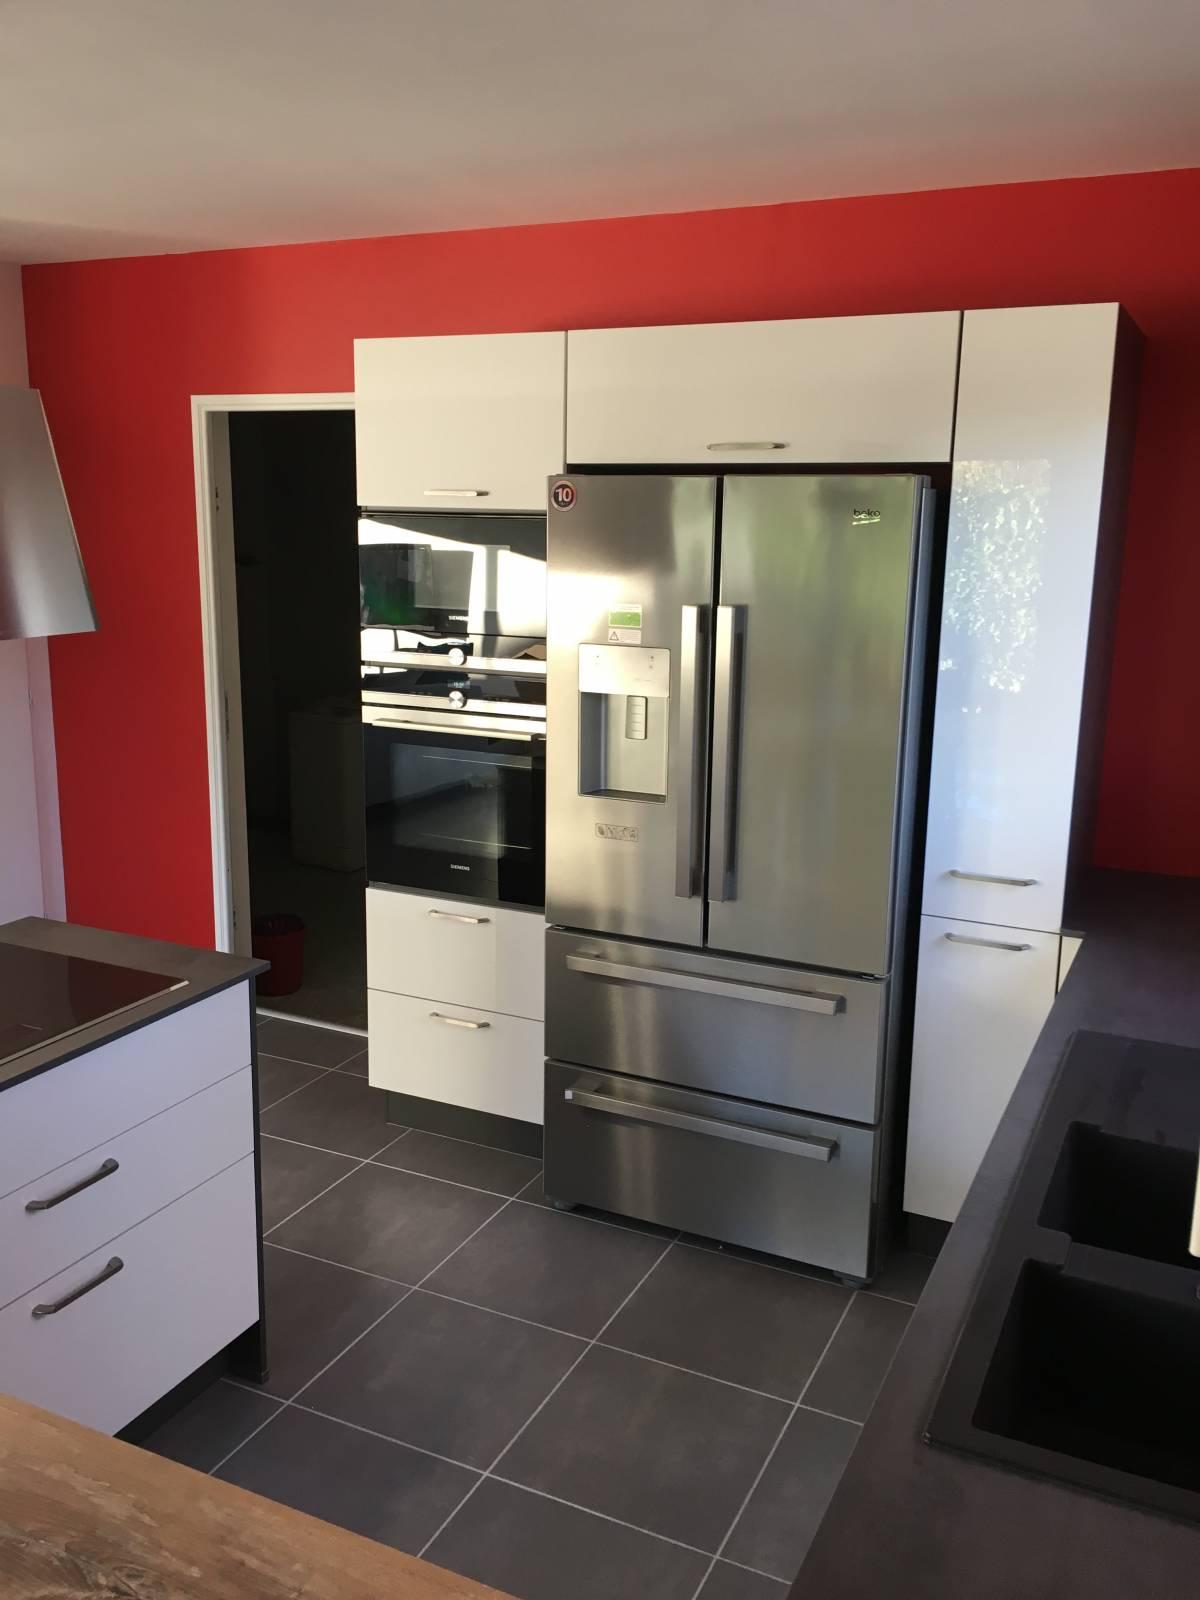 Cuisine avec frigo americain cuisine avec frigo amricain fresh cuisine d angle alamode - Frigo americain dans cuisine equipee ...